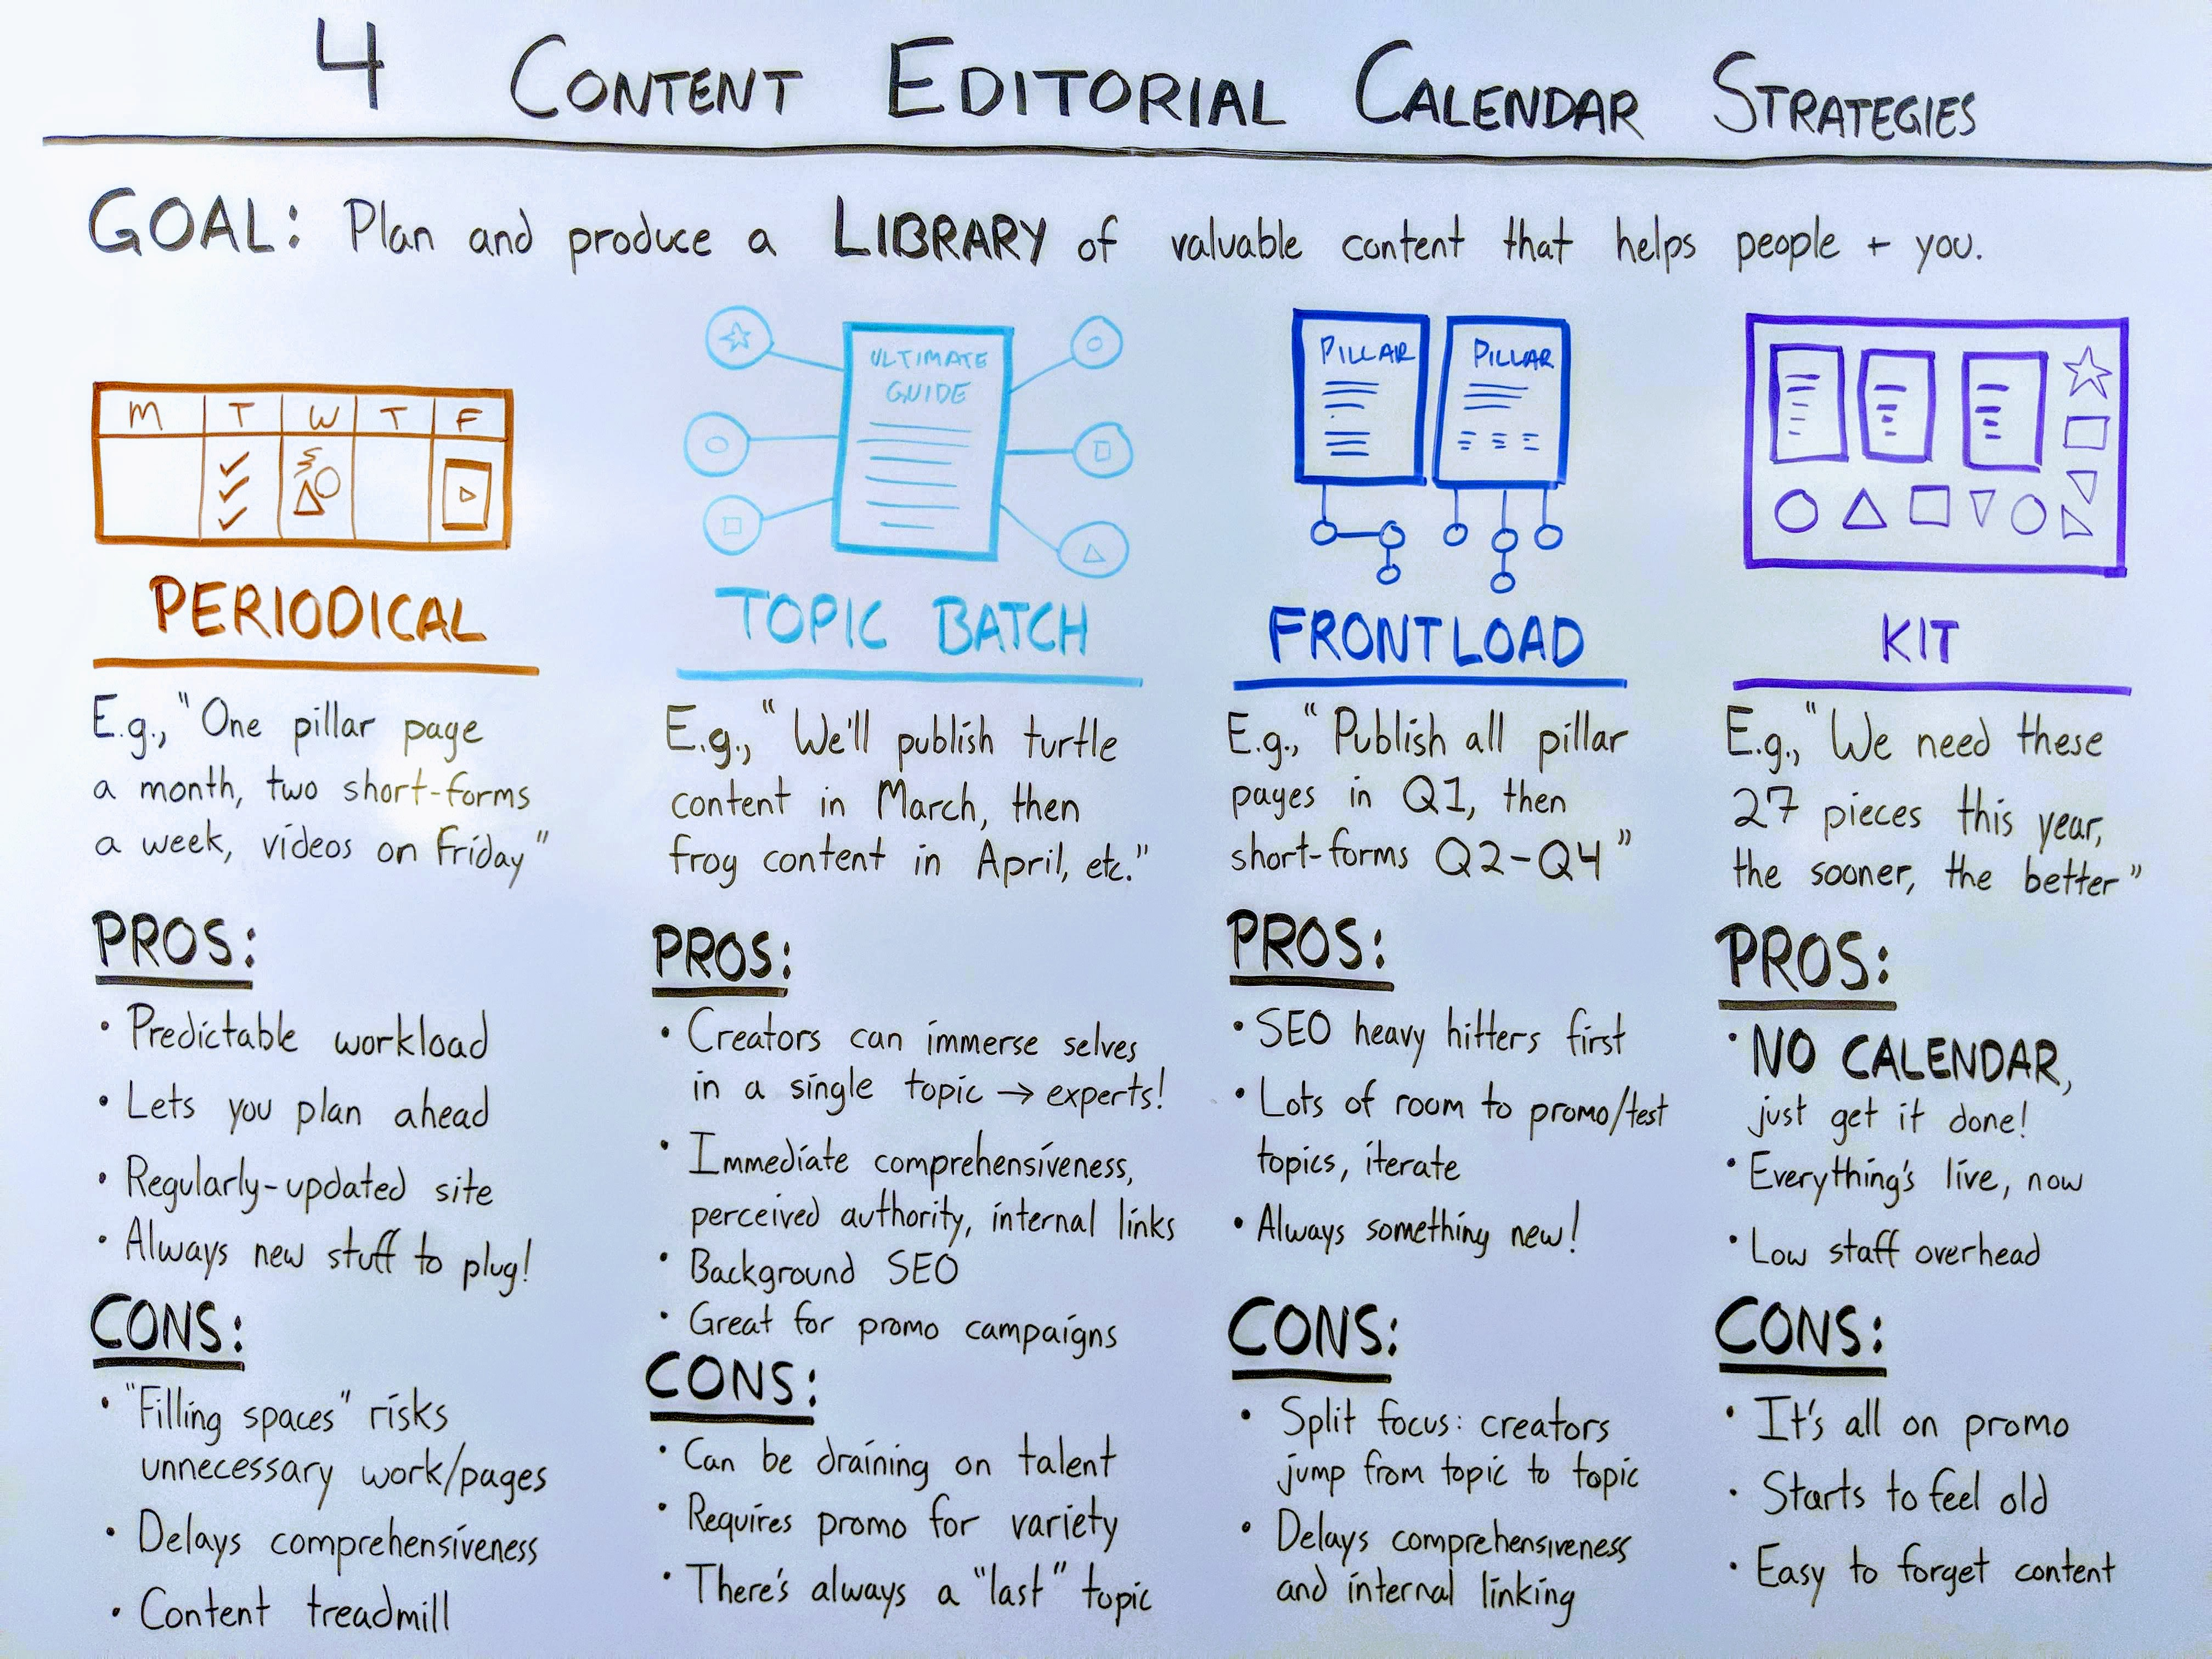 content-marketing-editorial-calendars